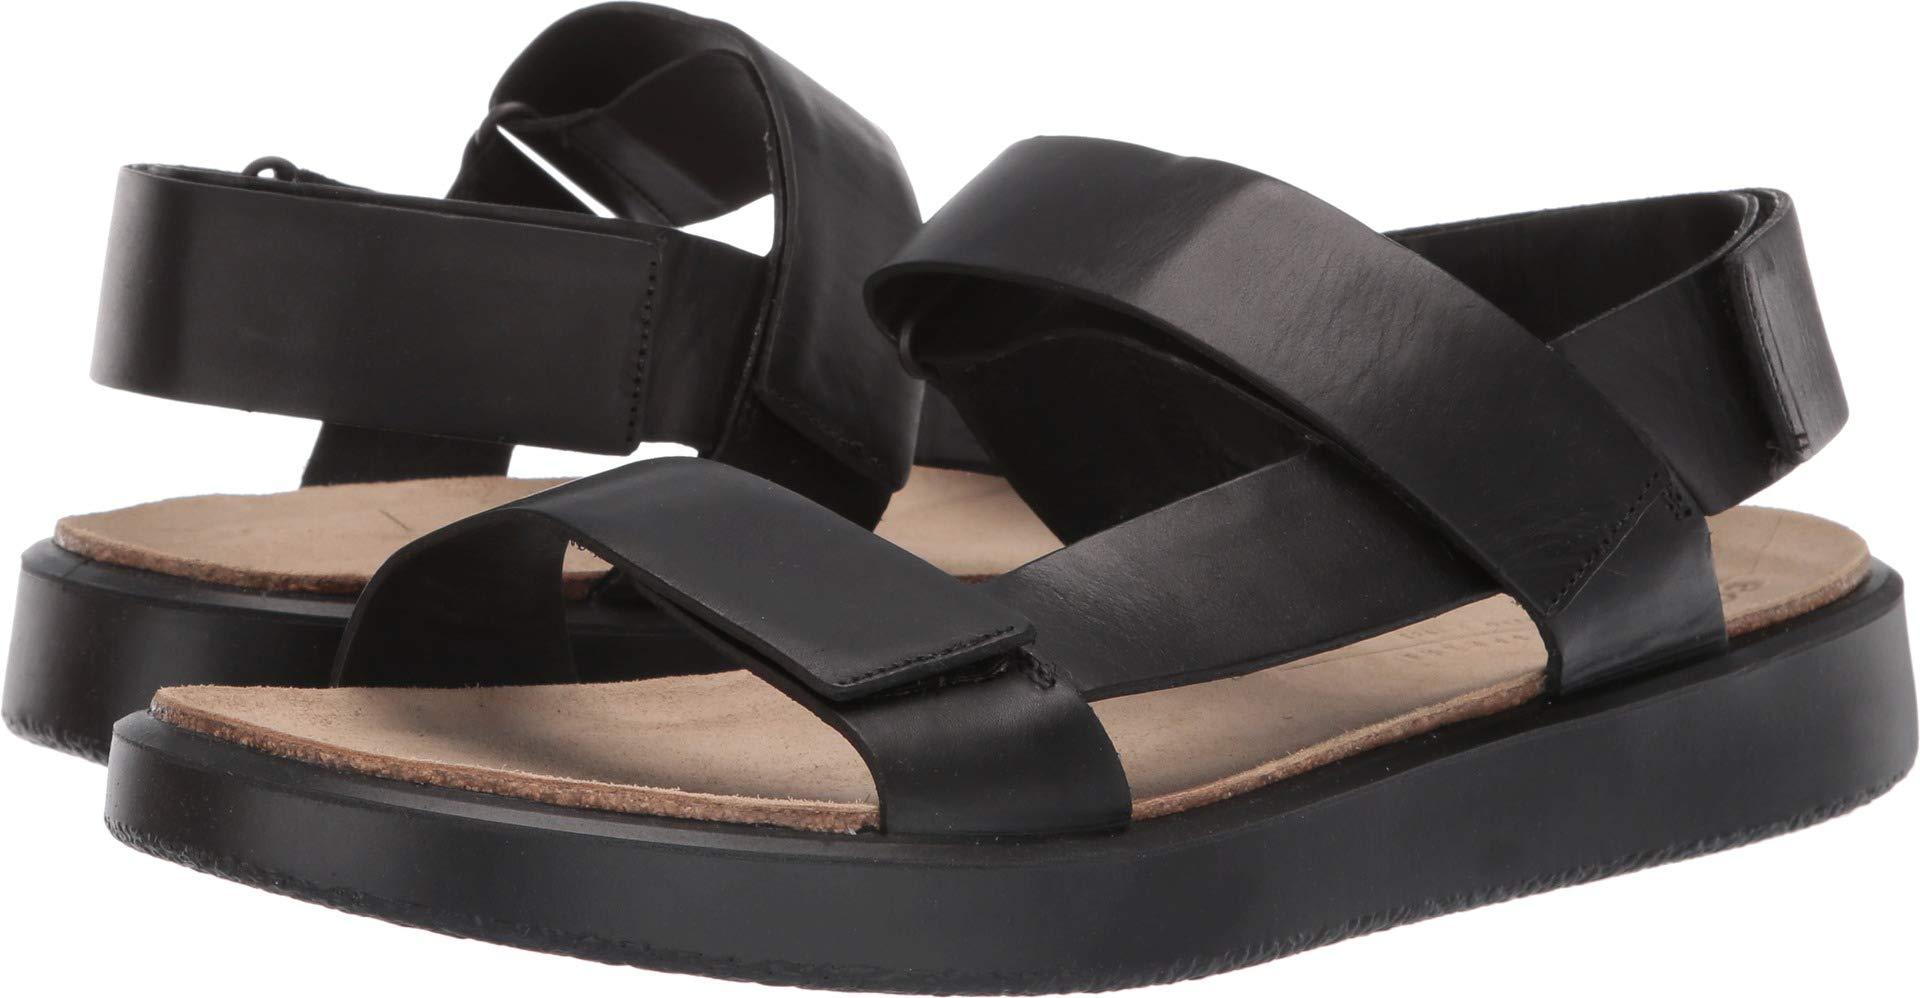 ECCO Men's CorkSphere Sandal Black 44 M EU (10-10.5 US)